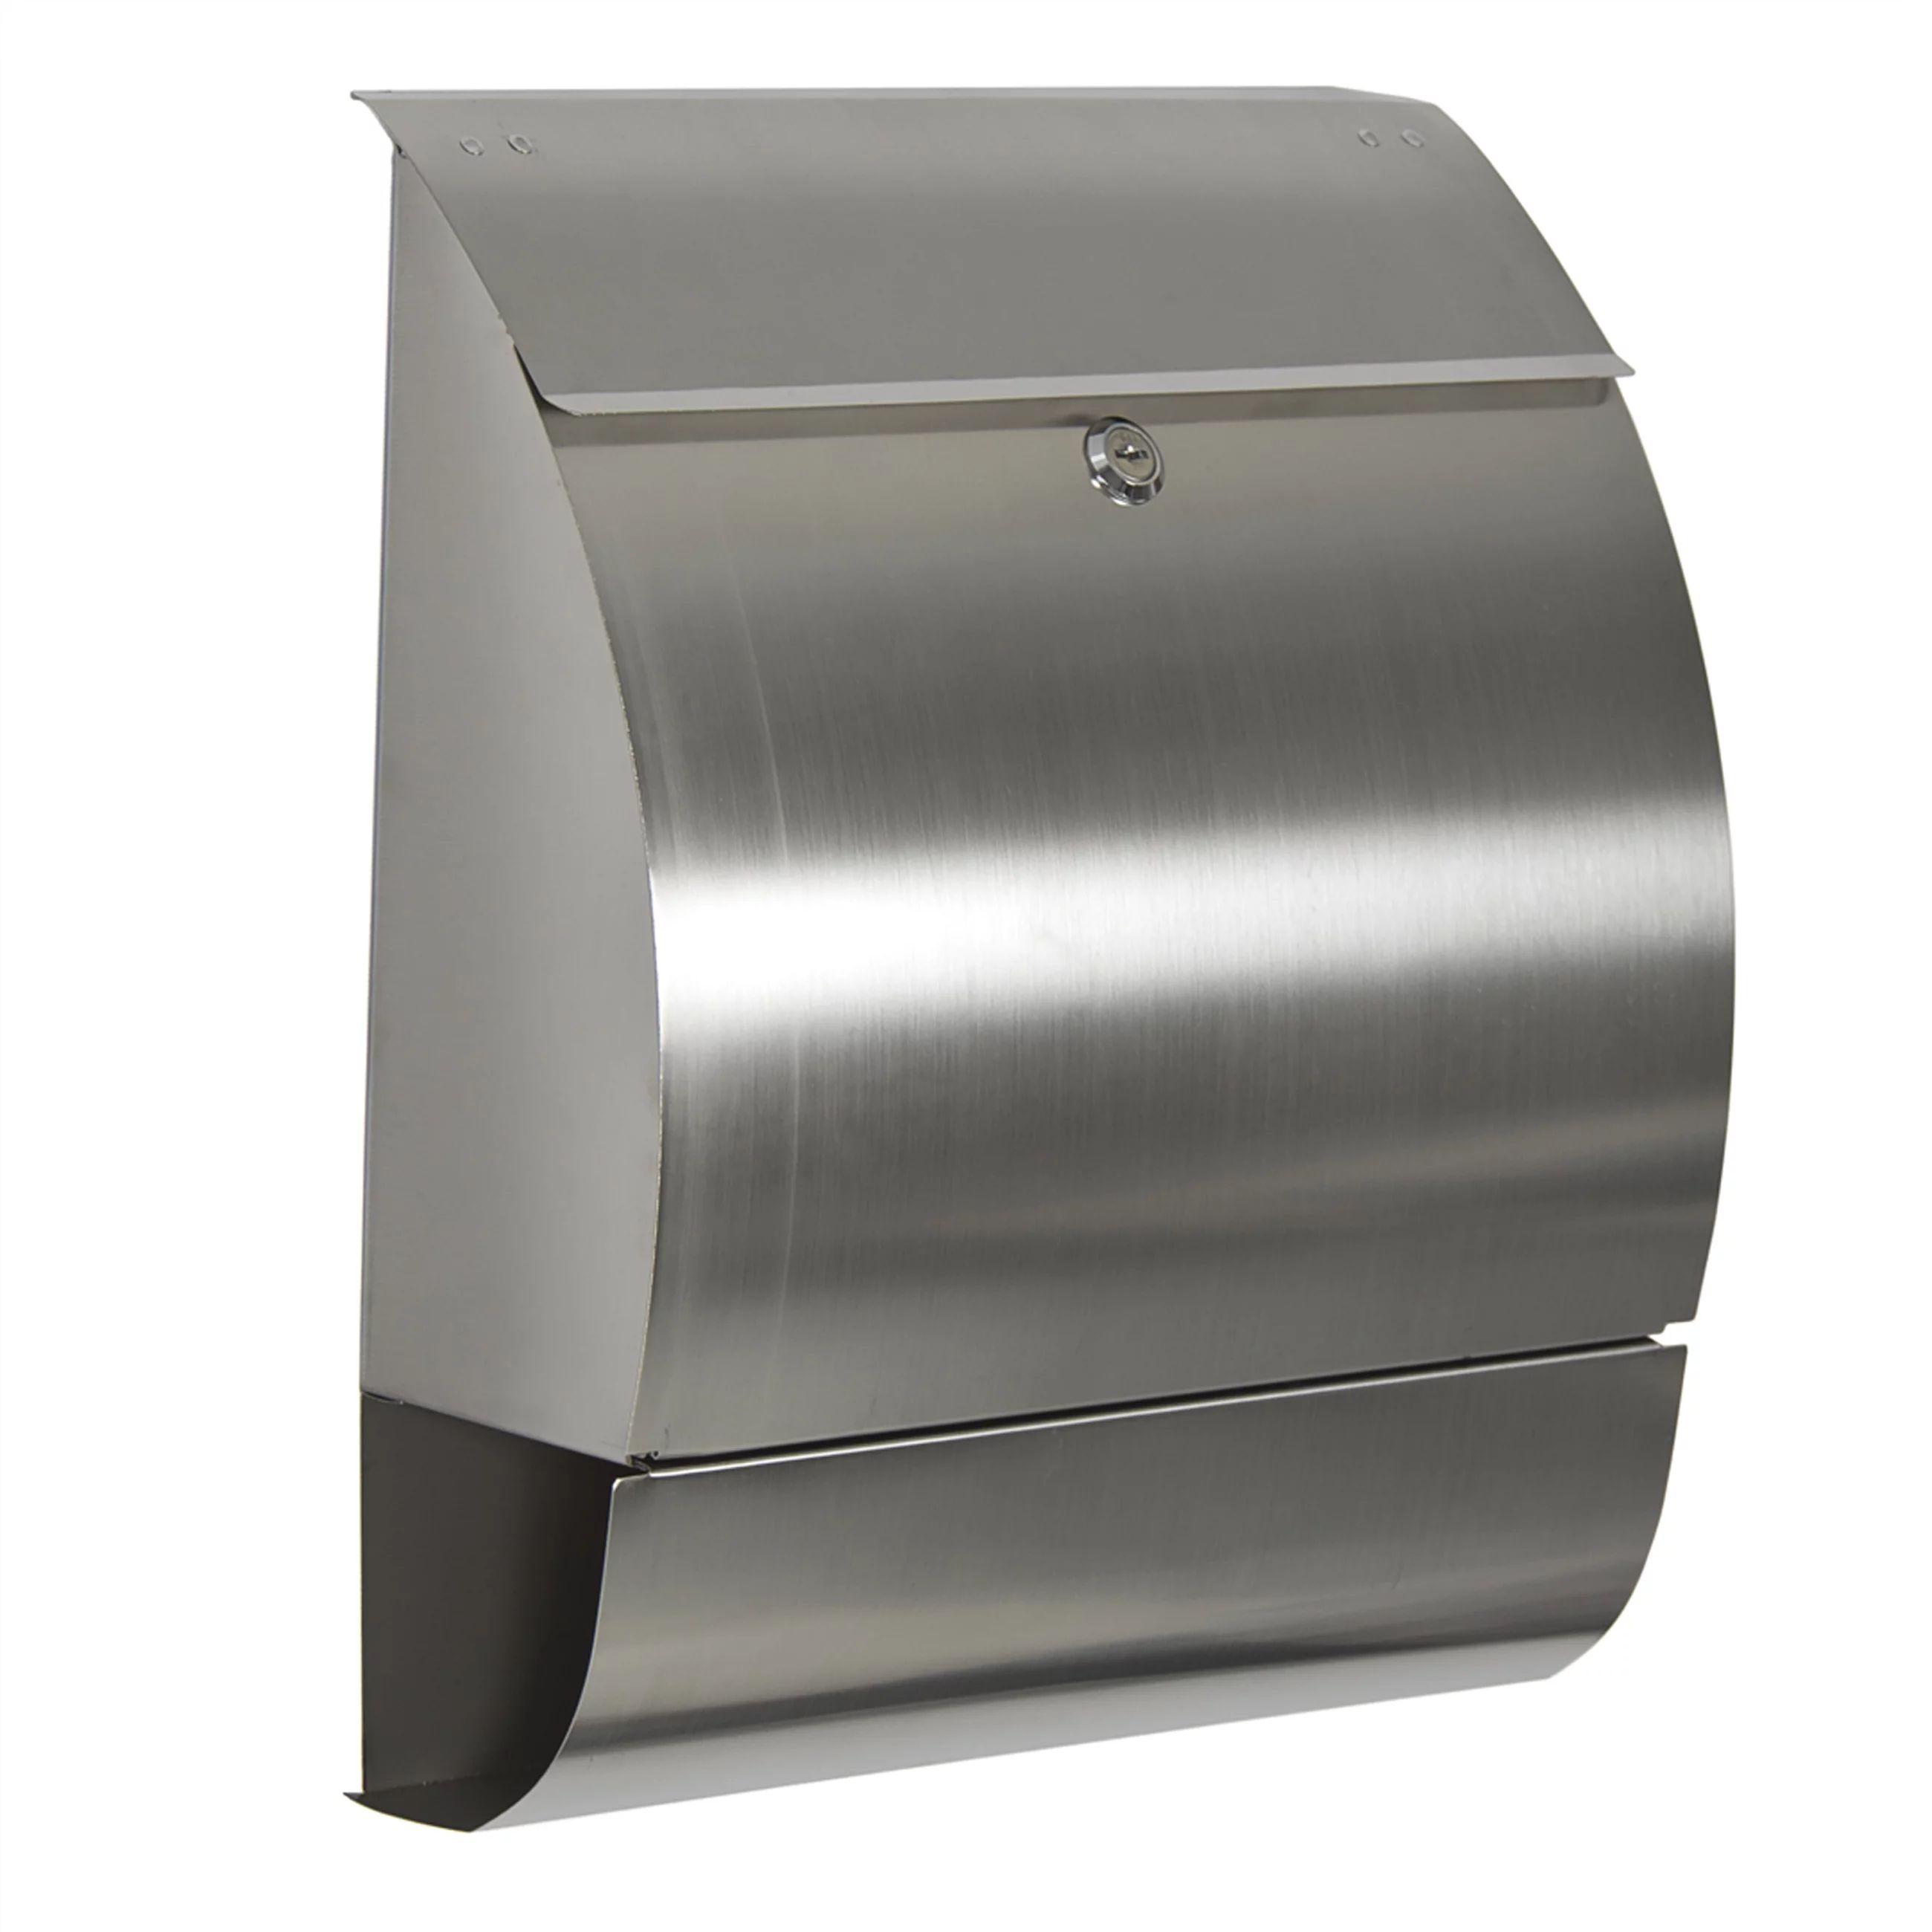 Mailbox stainless steel locking mail box letterbox postal box modern design new walmart com